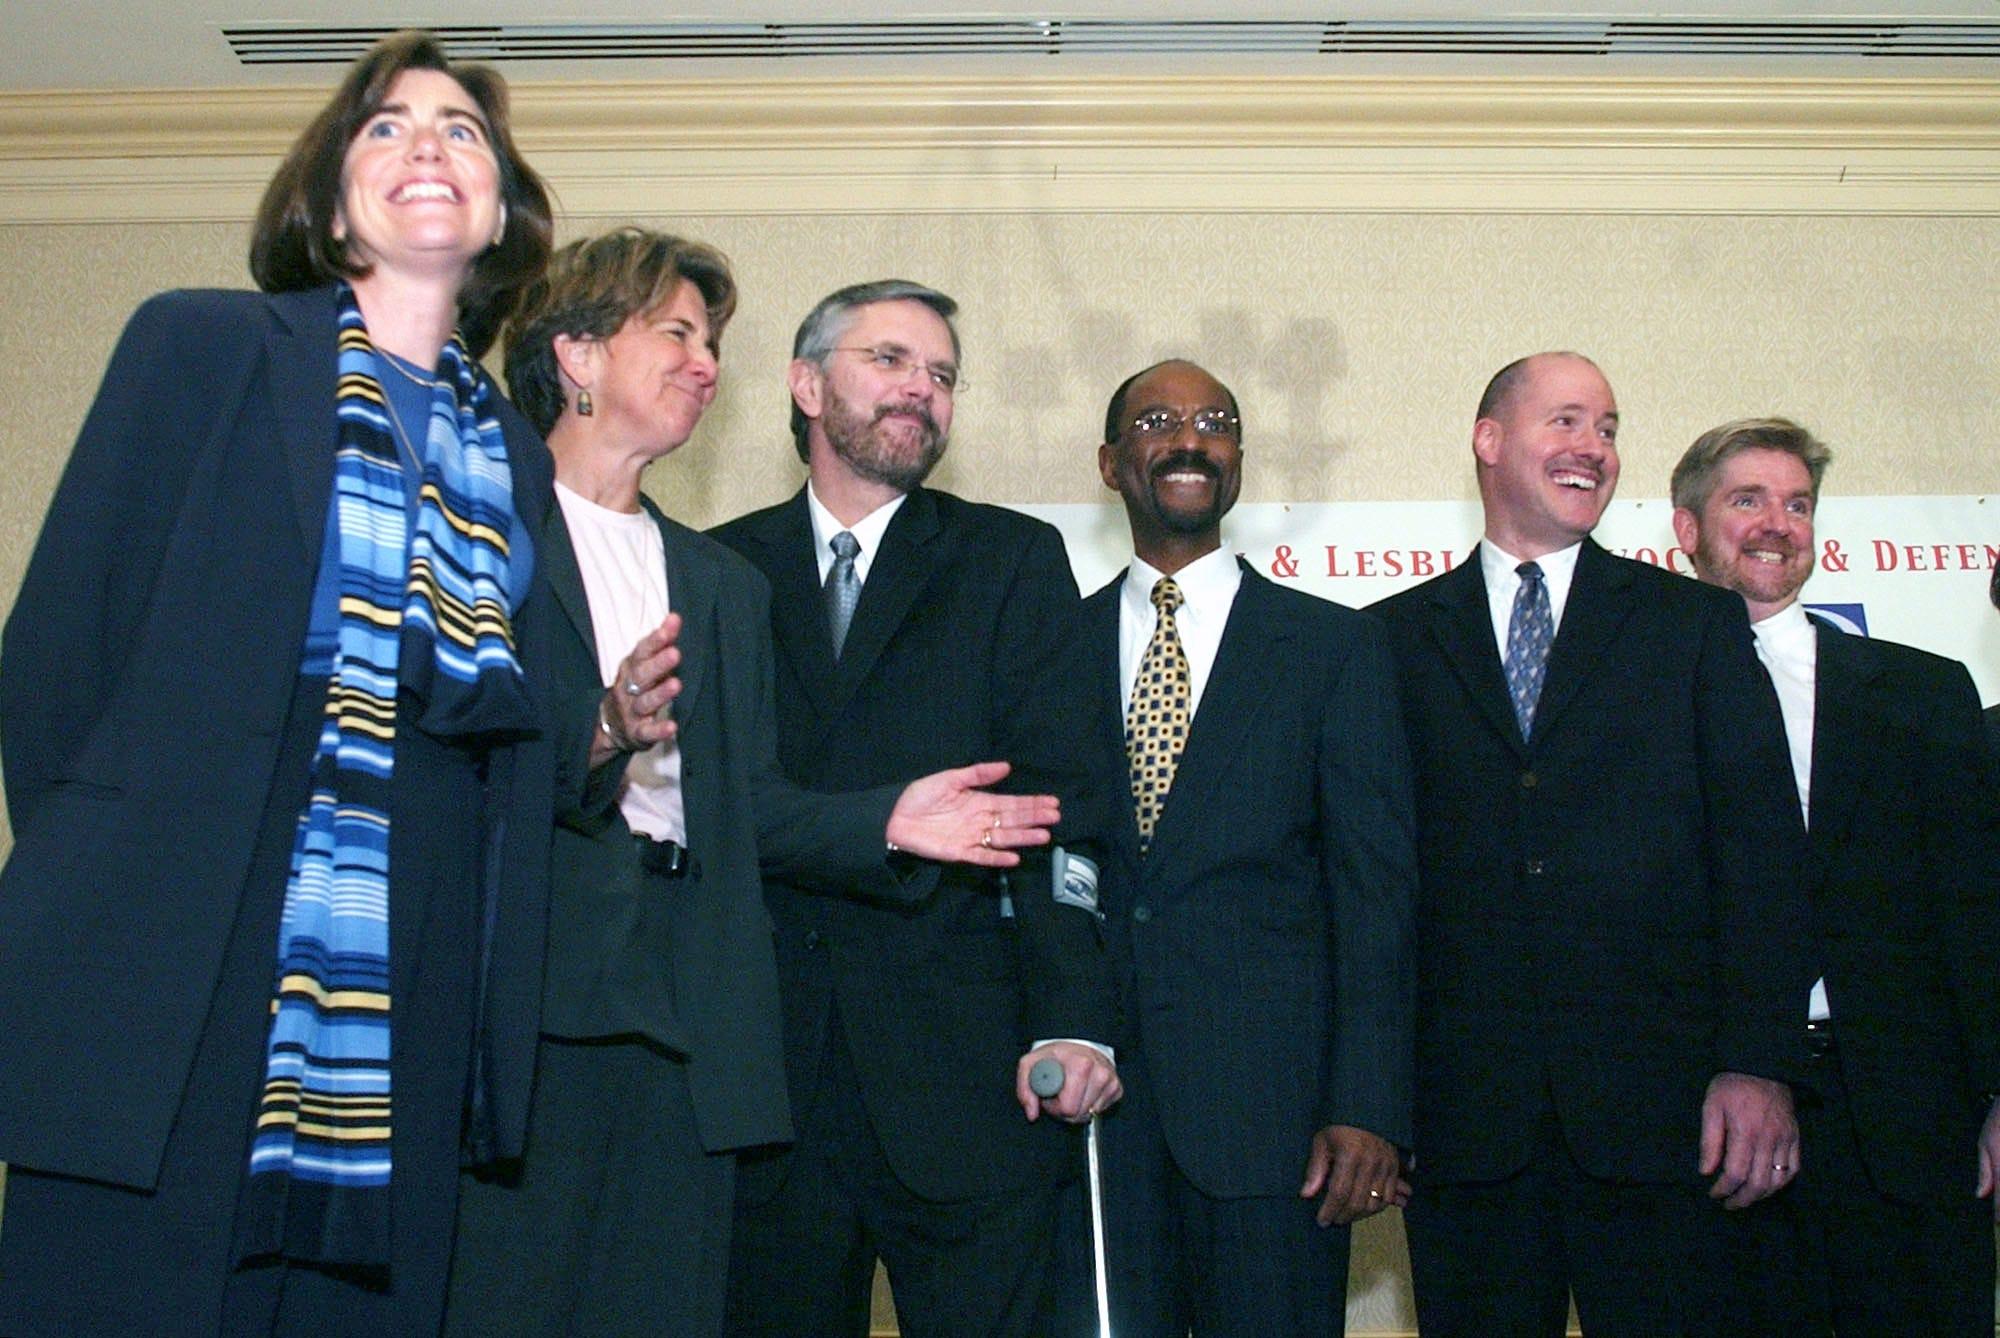 Massachusetts law on gay marriage